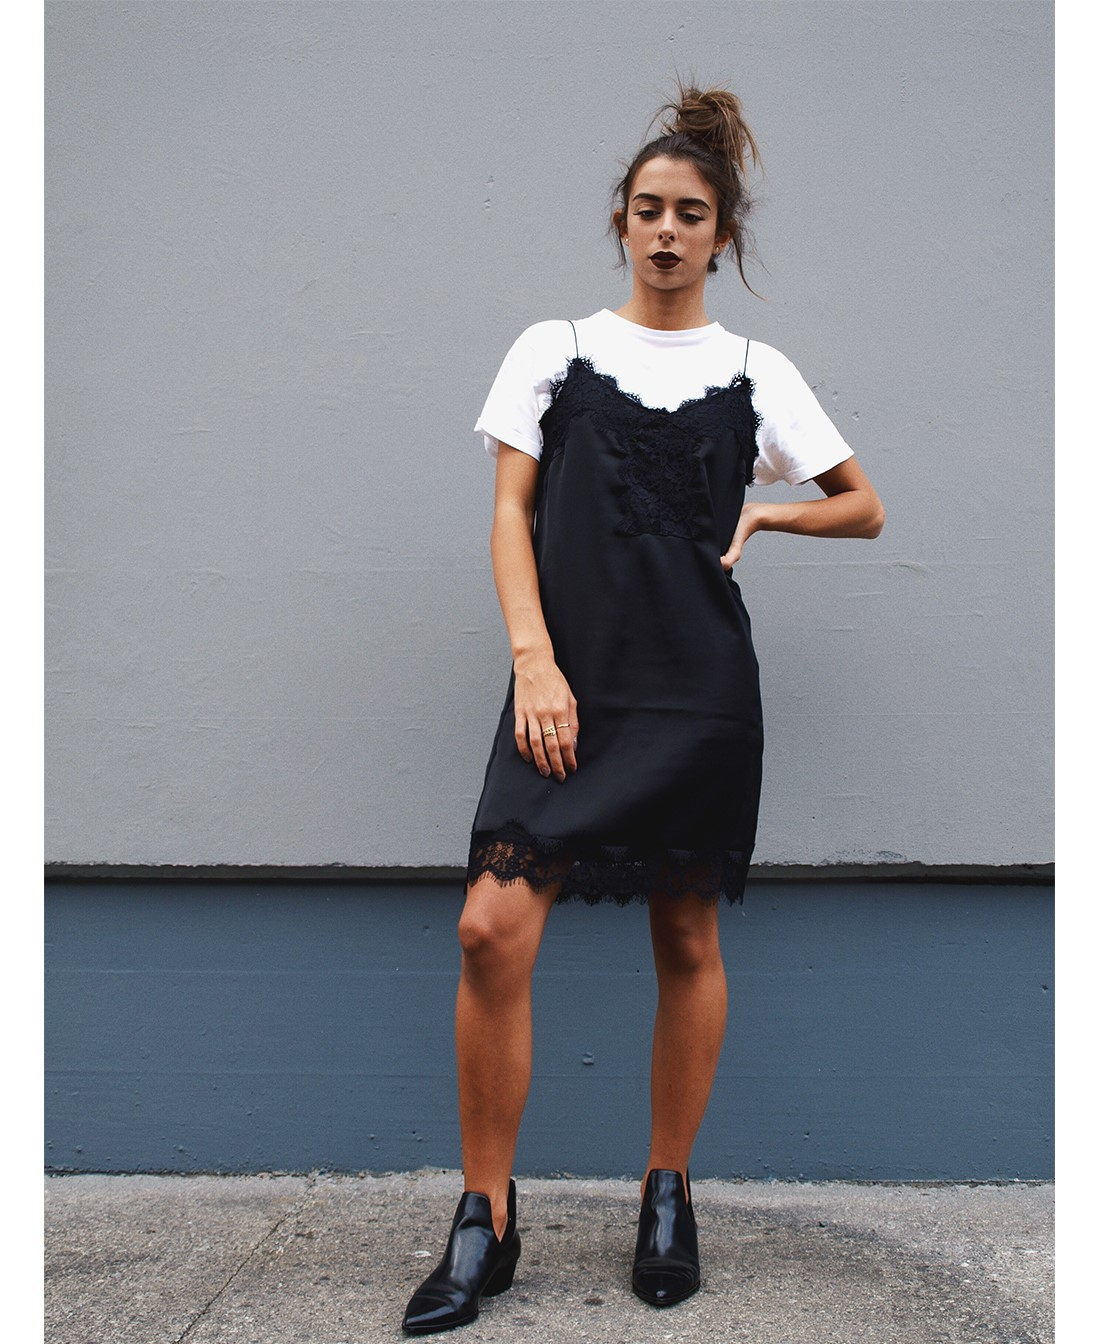 lingerie-dress-stradivarius-blackdress-thirt-sous-une-robe-blogger-hendaye-coastalandco-superposition